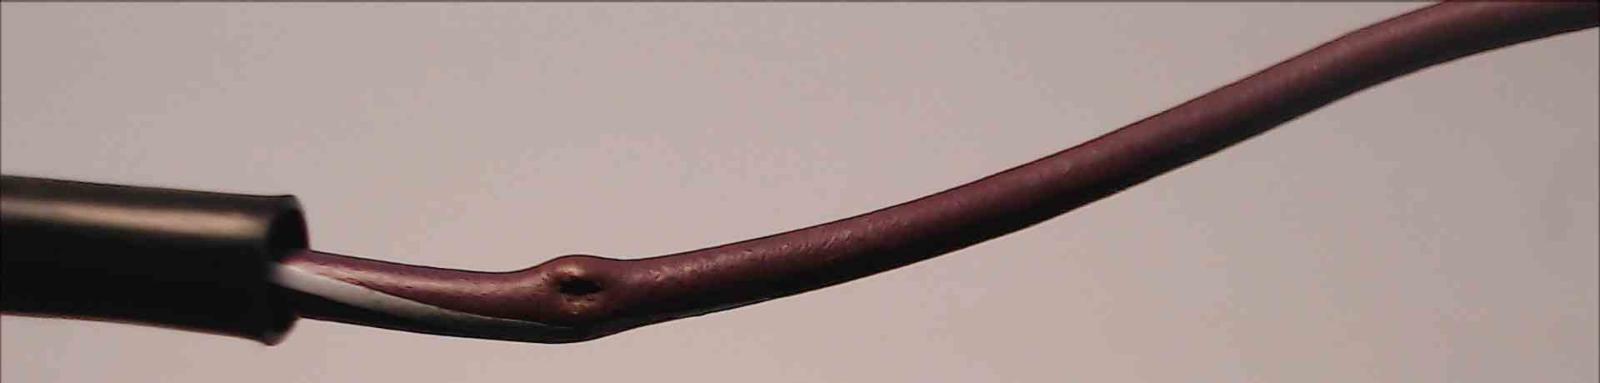 581748 0581748 Johnson Evinrude 1977 Choke Solenoid 85 115 140 HP